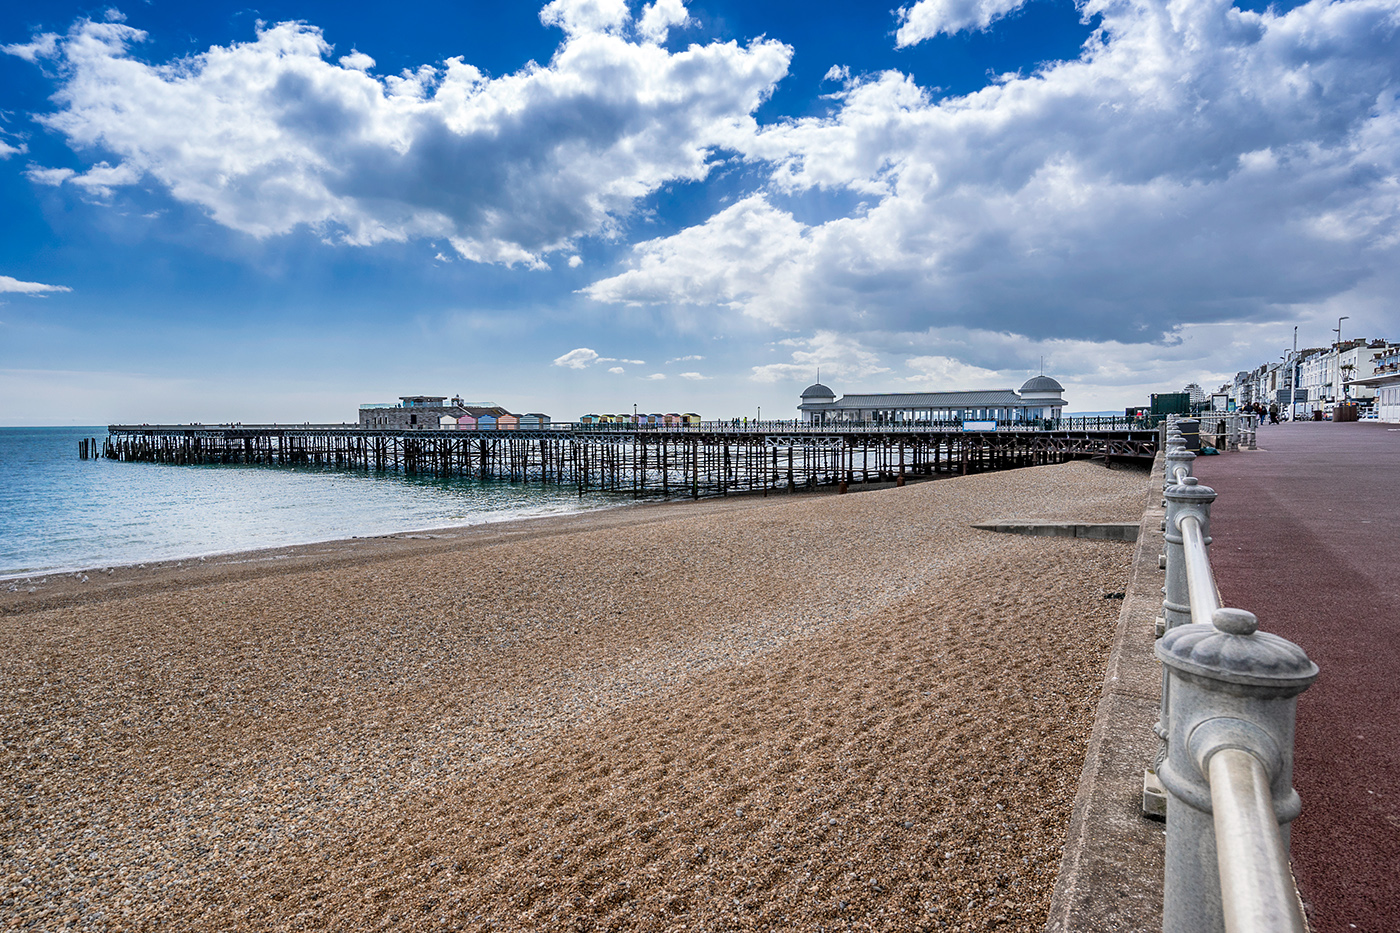 A view along the beach toward Hastings Pier